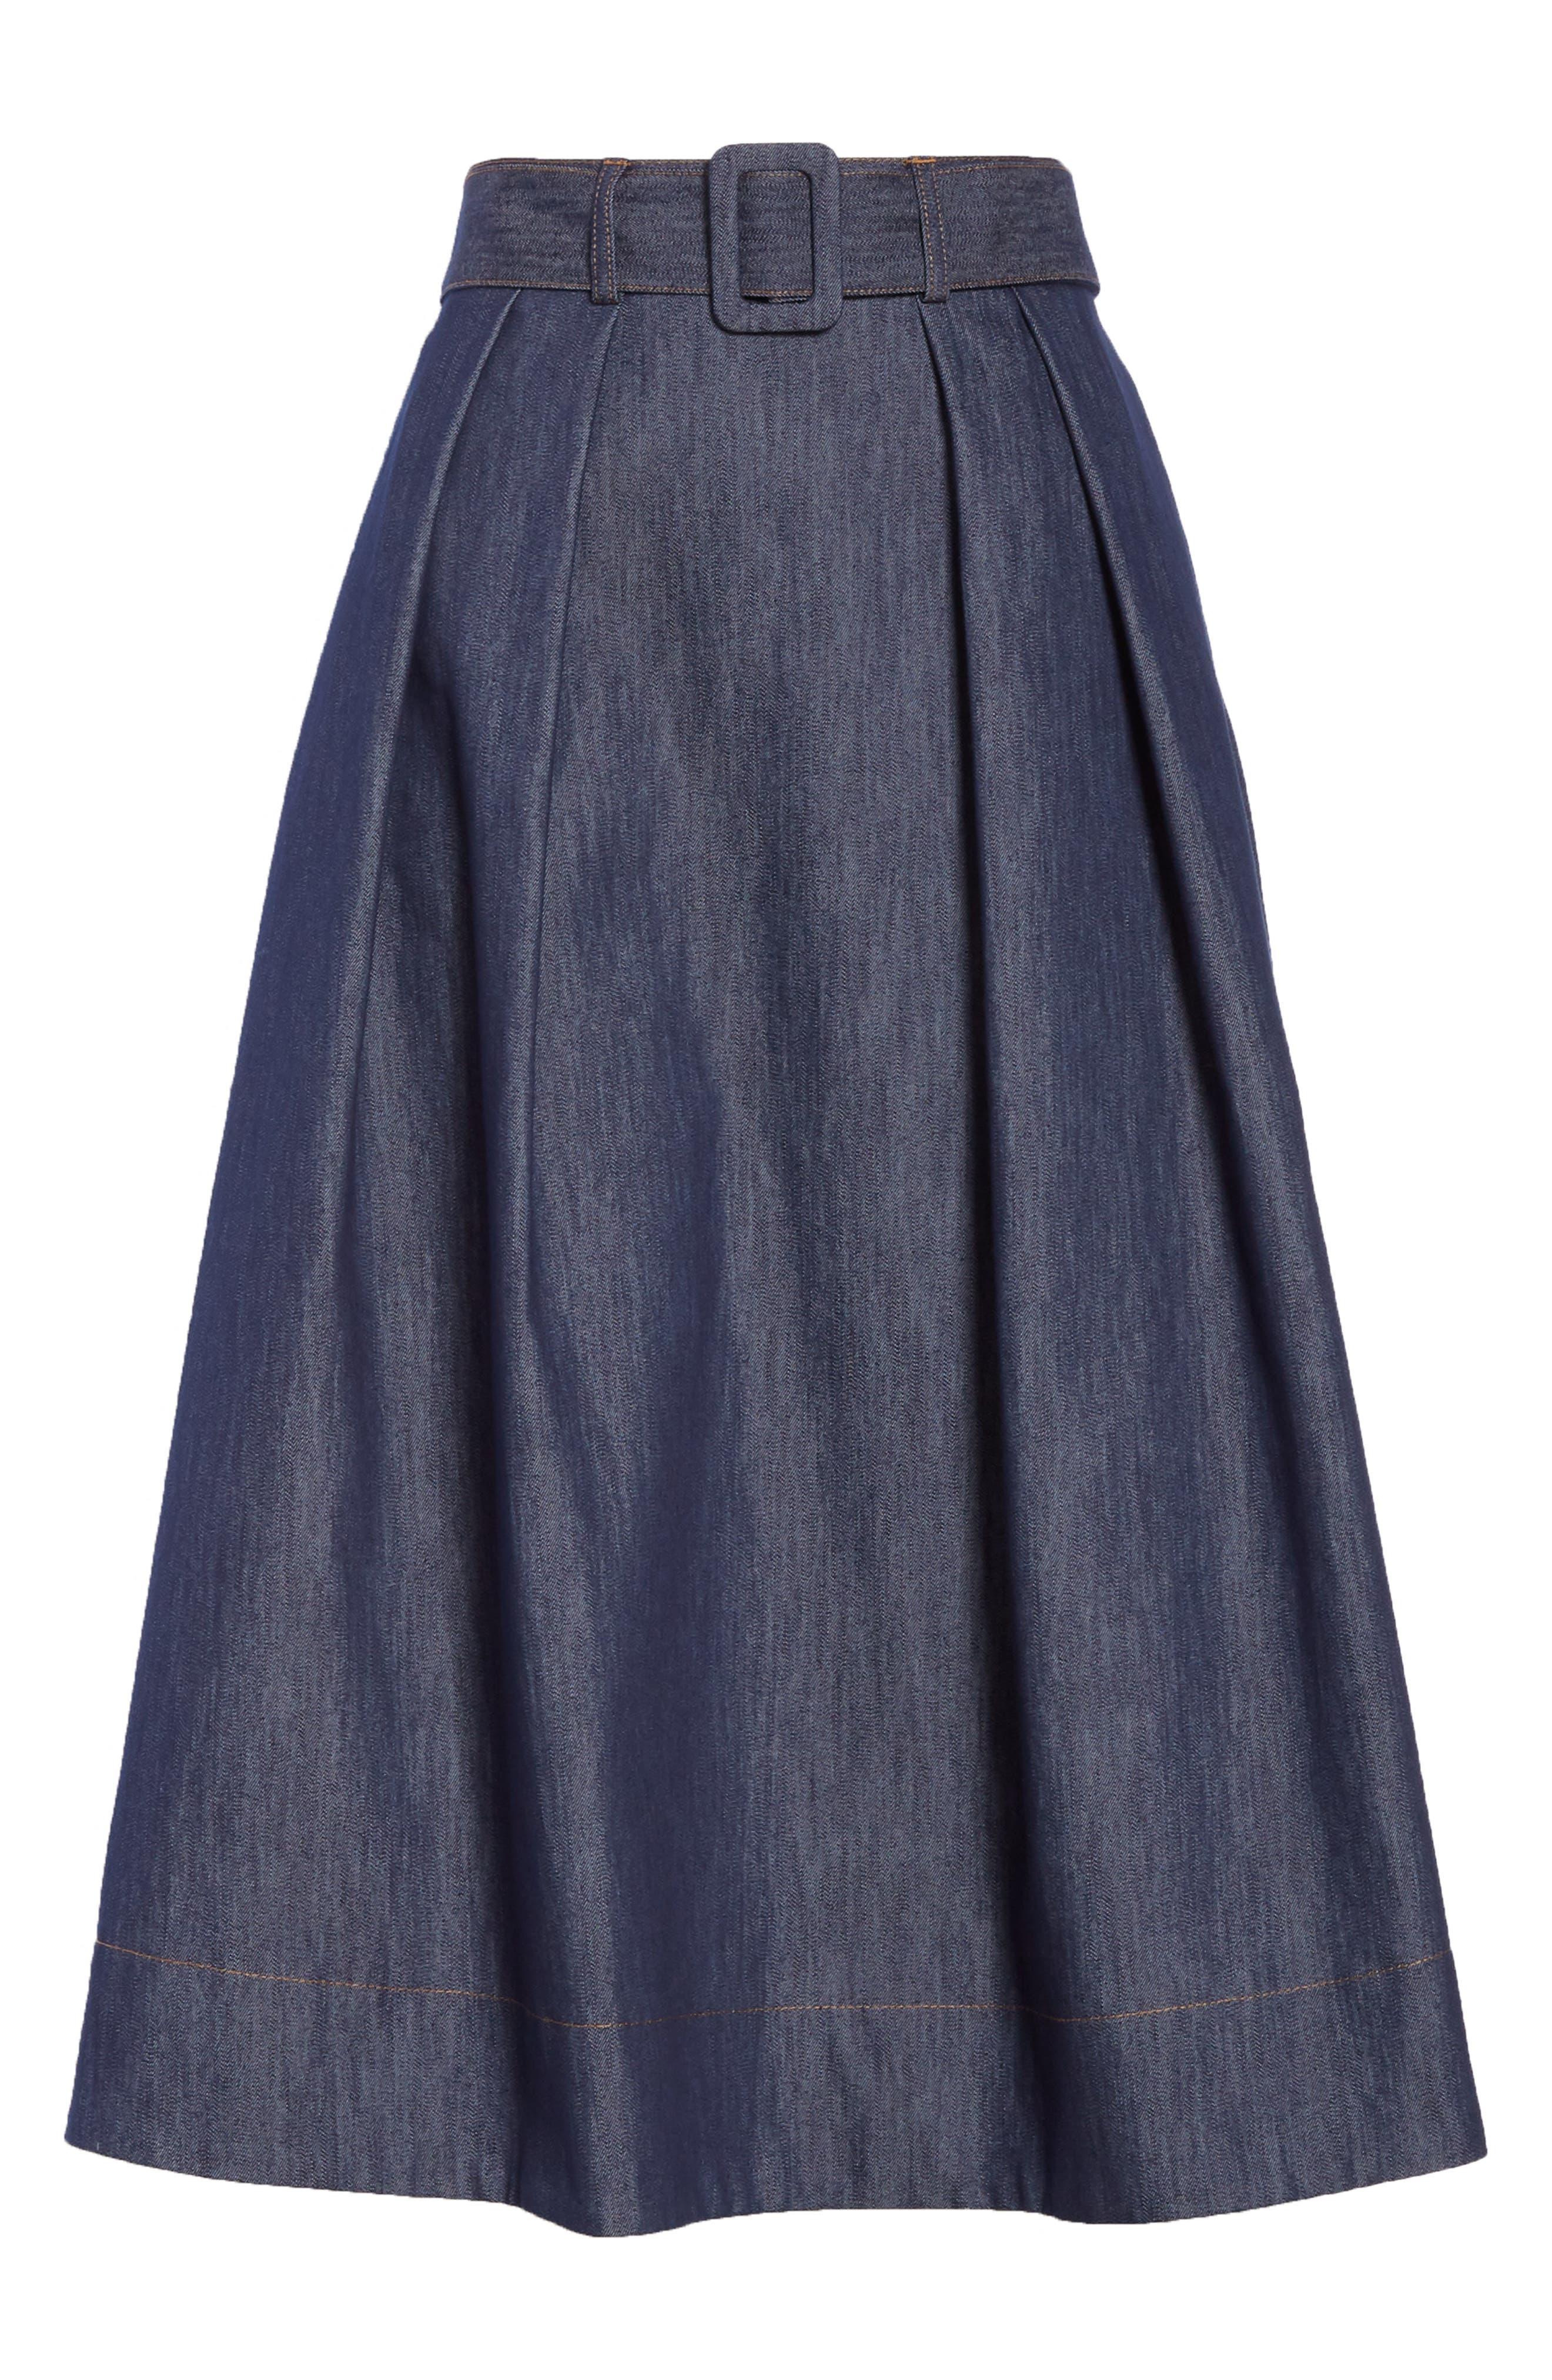 TOMMY X ZENDAYA, Belted Denim Skirt, Alternate thumbnail 6, color, 402